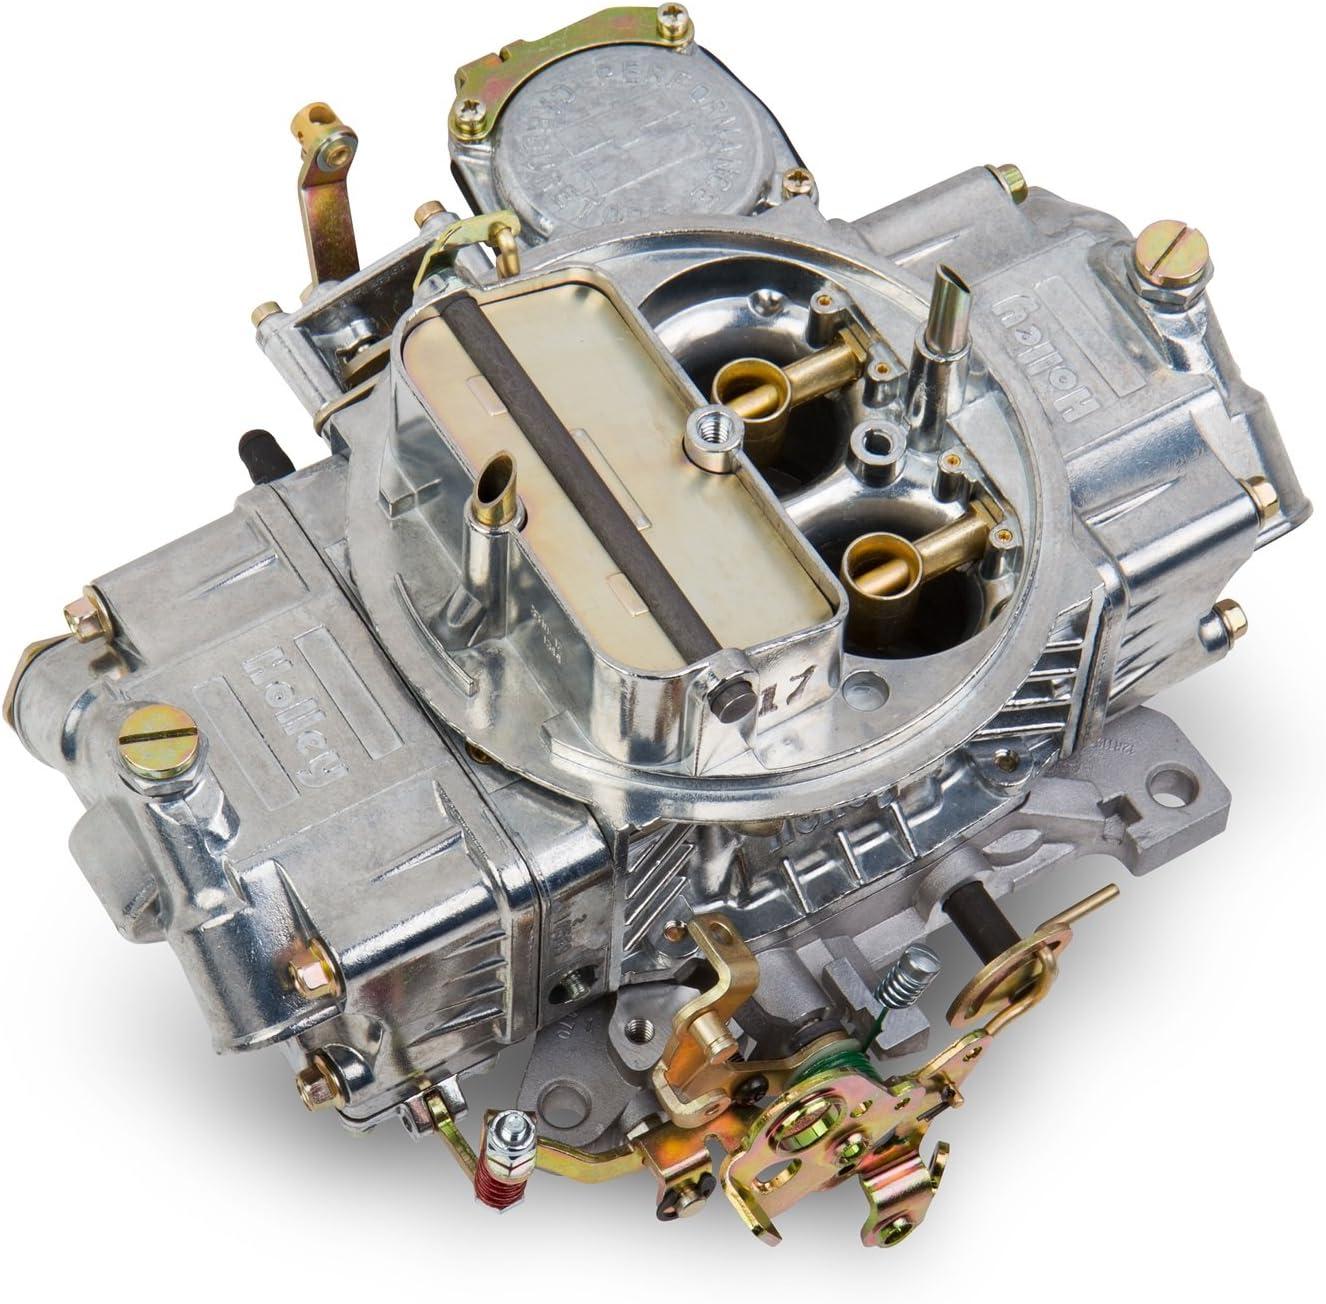 B00029J3YI Holley 0-3310S Model 4160 Street Performance 750 CFM Square Bore 4-Barrel Vacuum Secondary Manual Choke New Carburetor 812X8of2BB8L.SL1500_